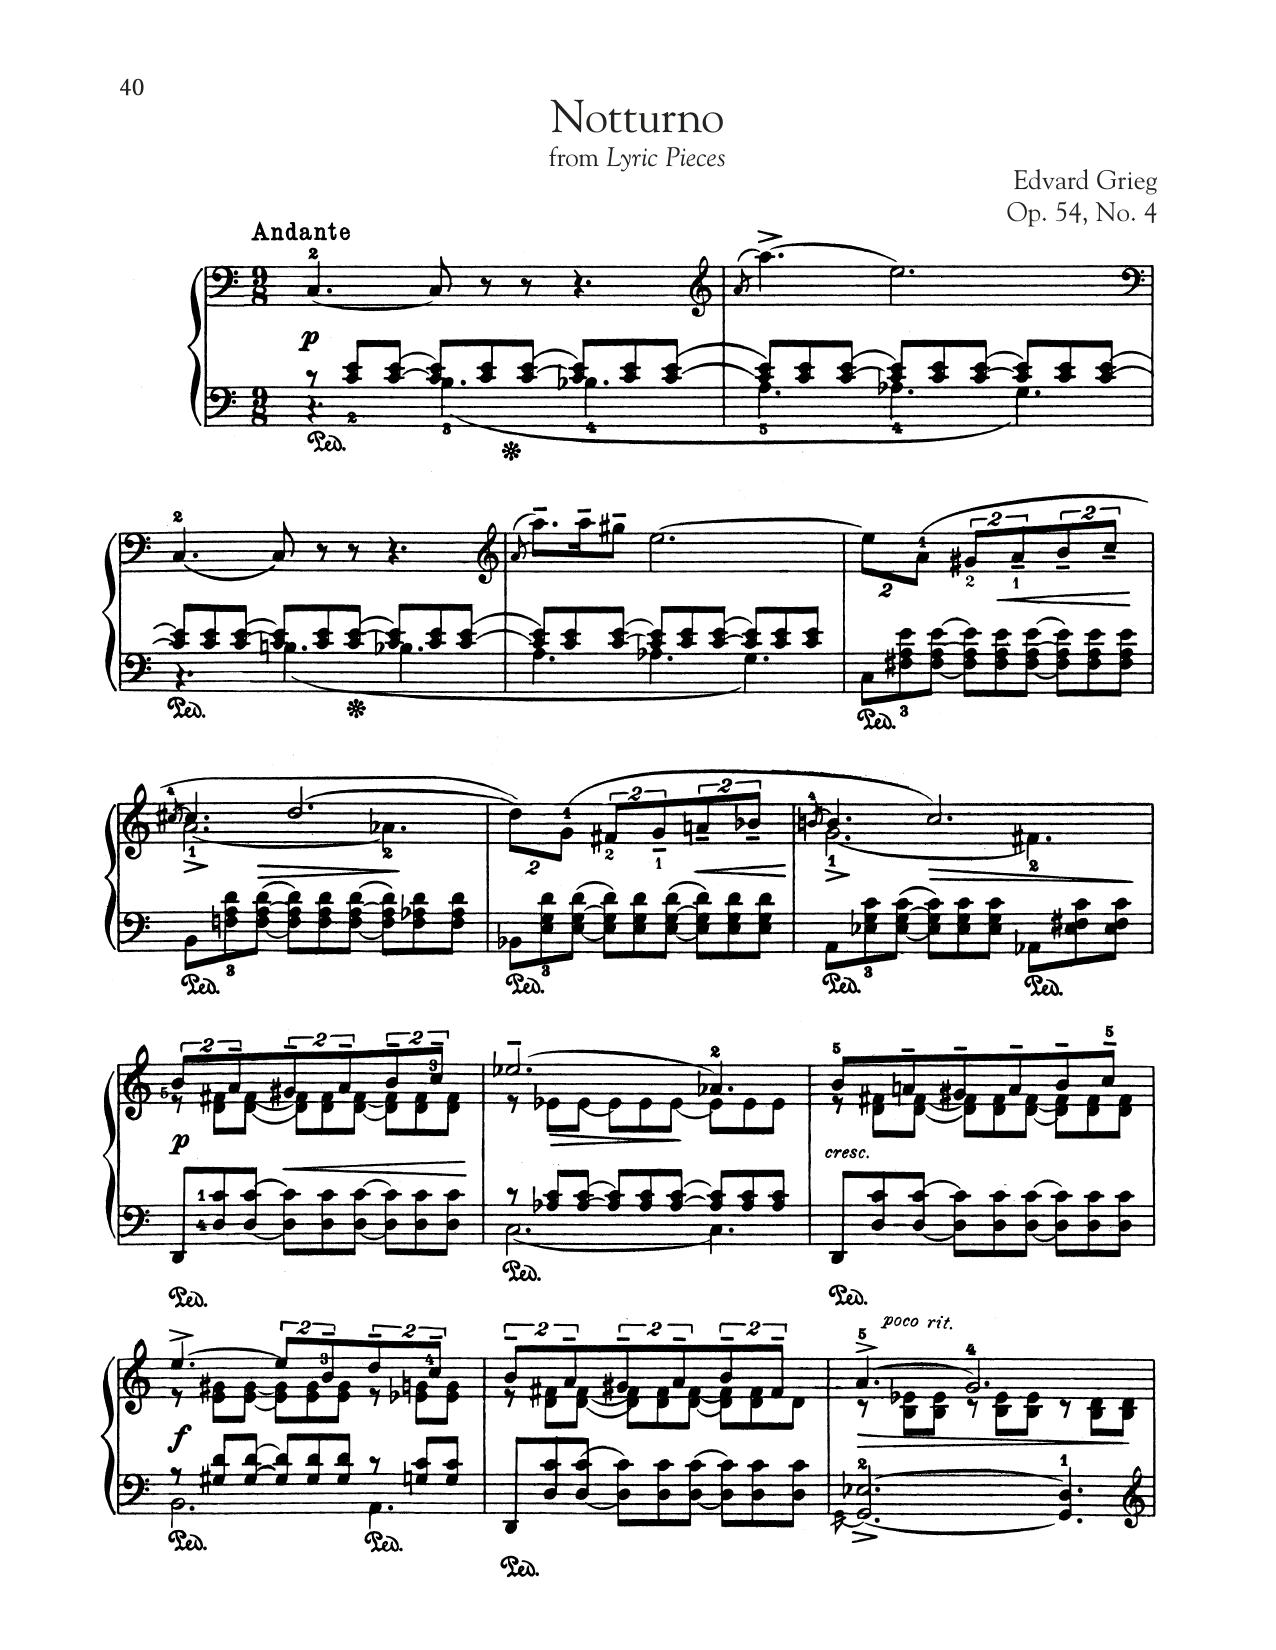 Notturno, Op. 54, No. 4 (Piano Solo)